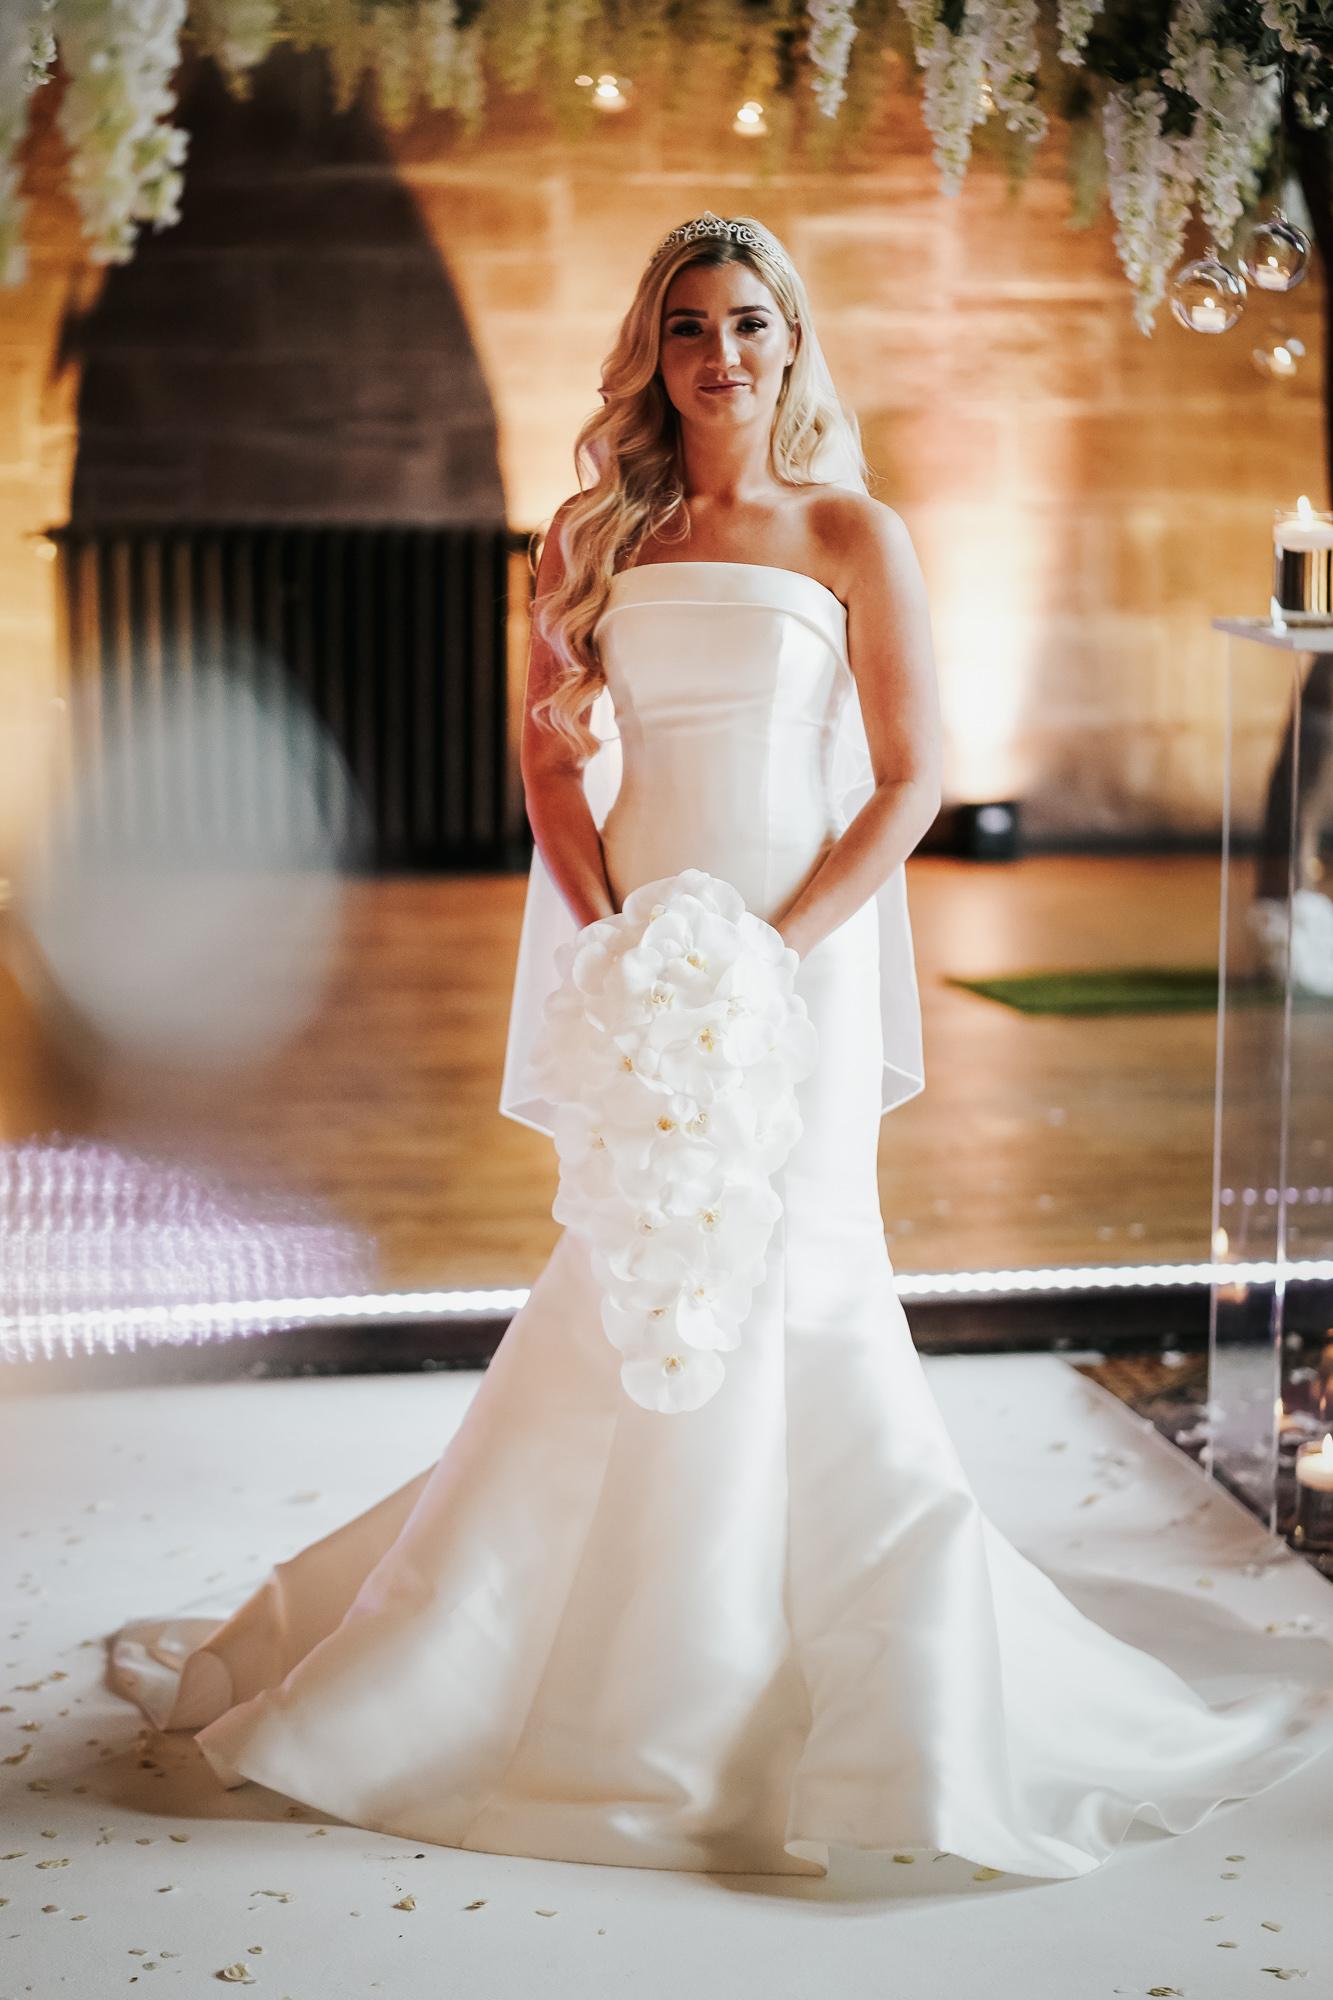 Peckforton Castle wedding photography cheshire wedding photographer (27 of 57).jpg